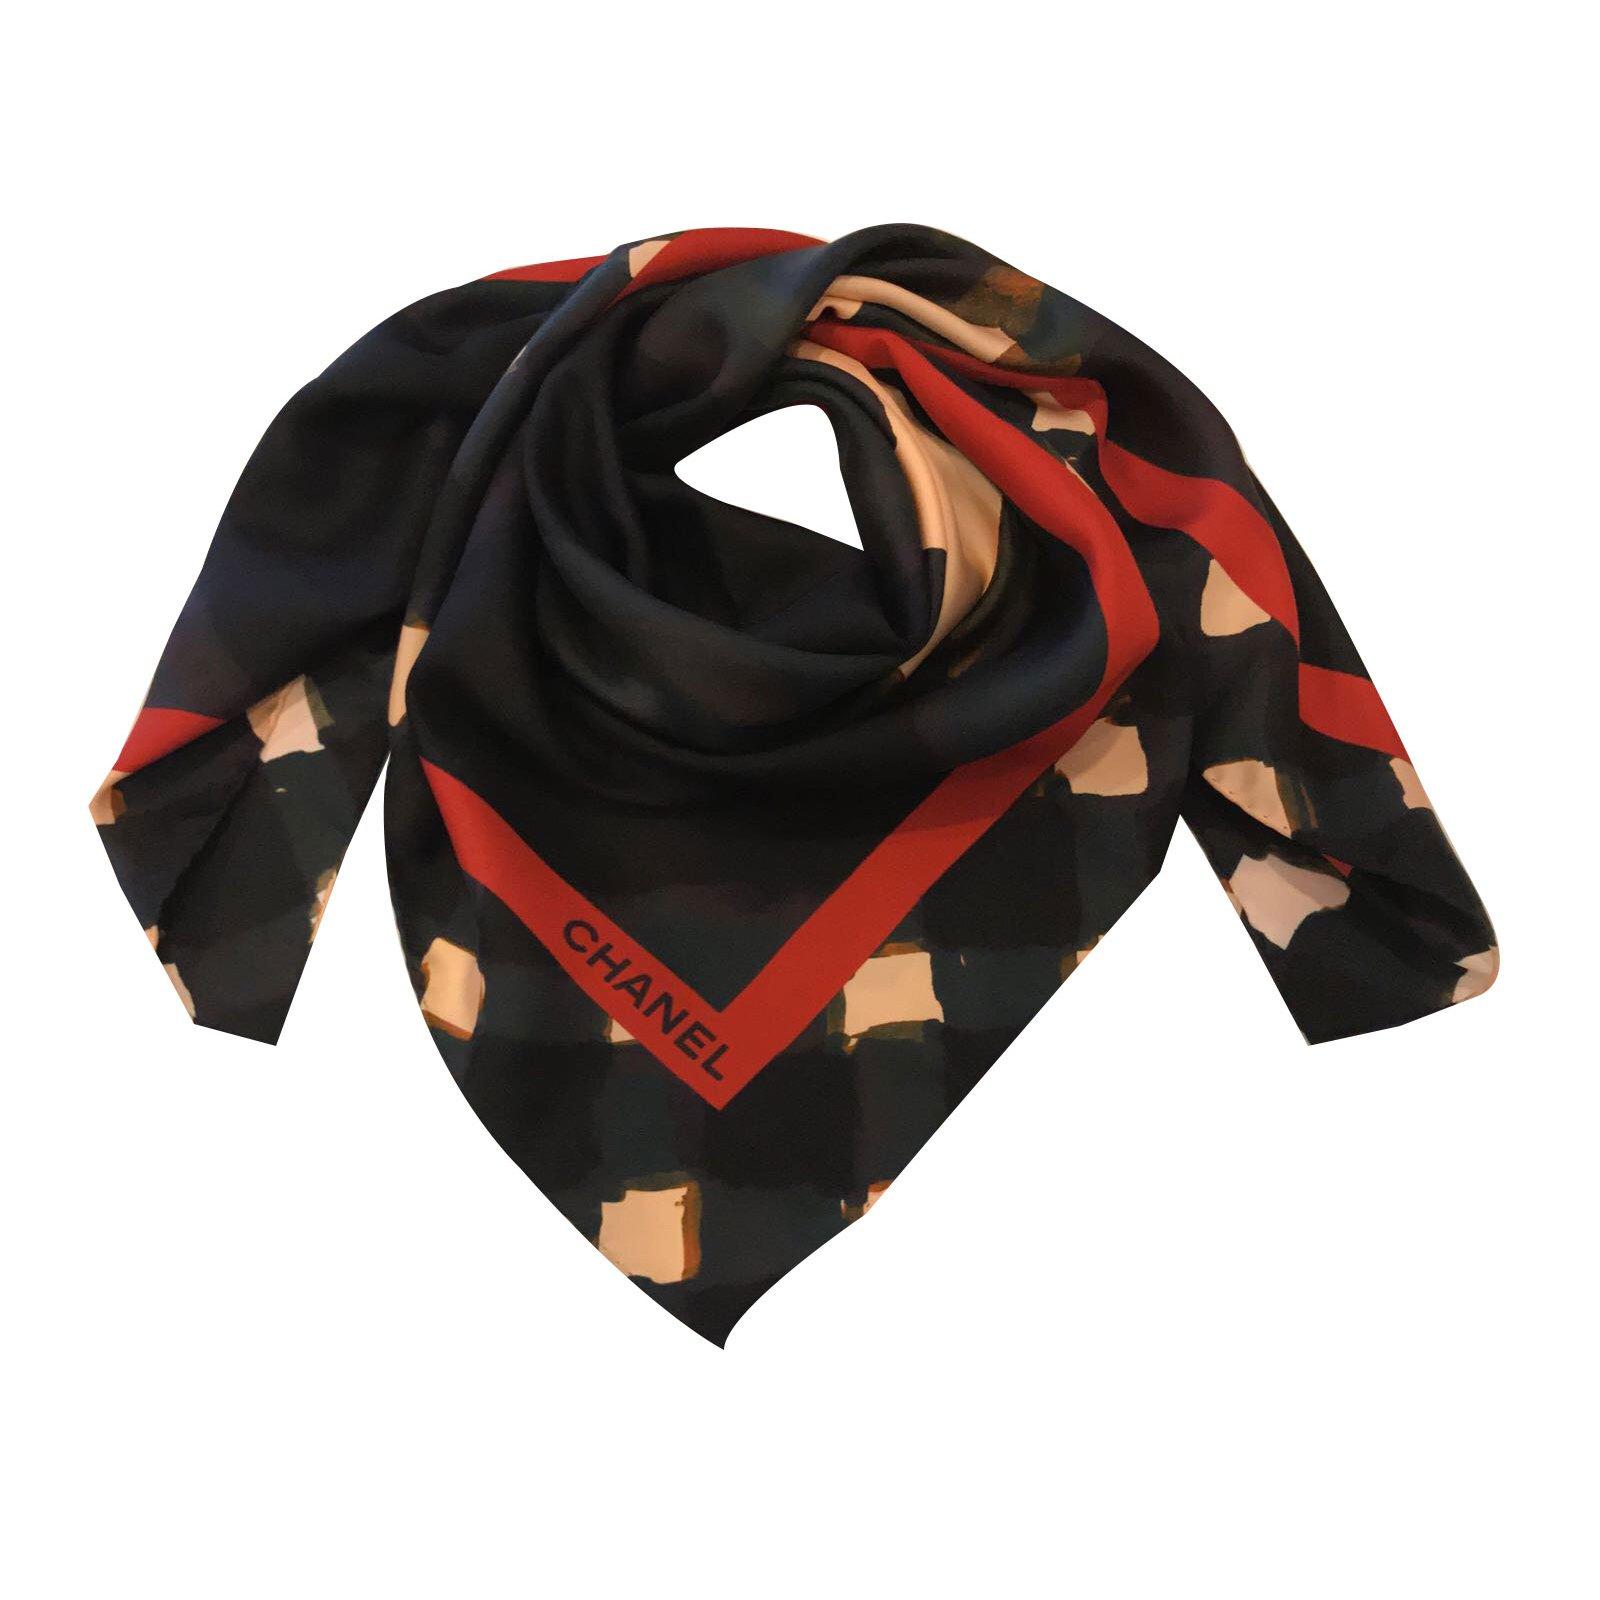 Foulards Chanel Foulard soie Chanel Soie Noir ref.51753 - Joli Closet 3f9484116a9